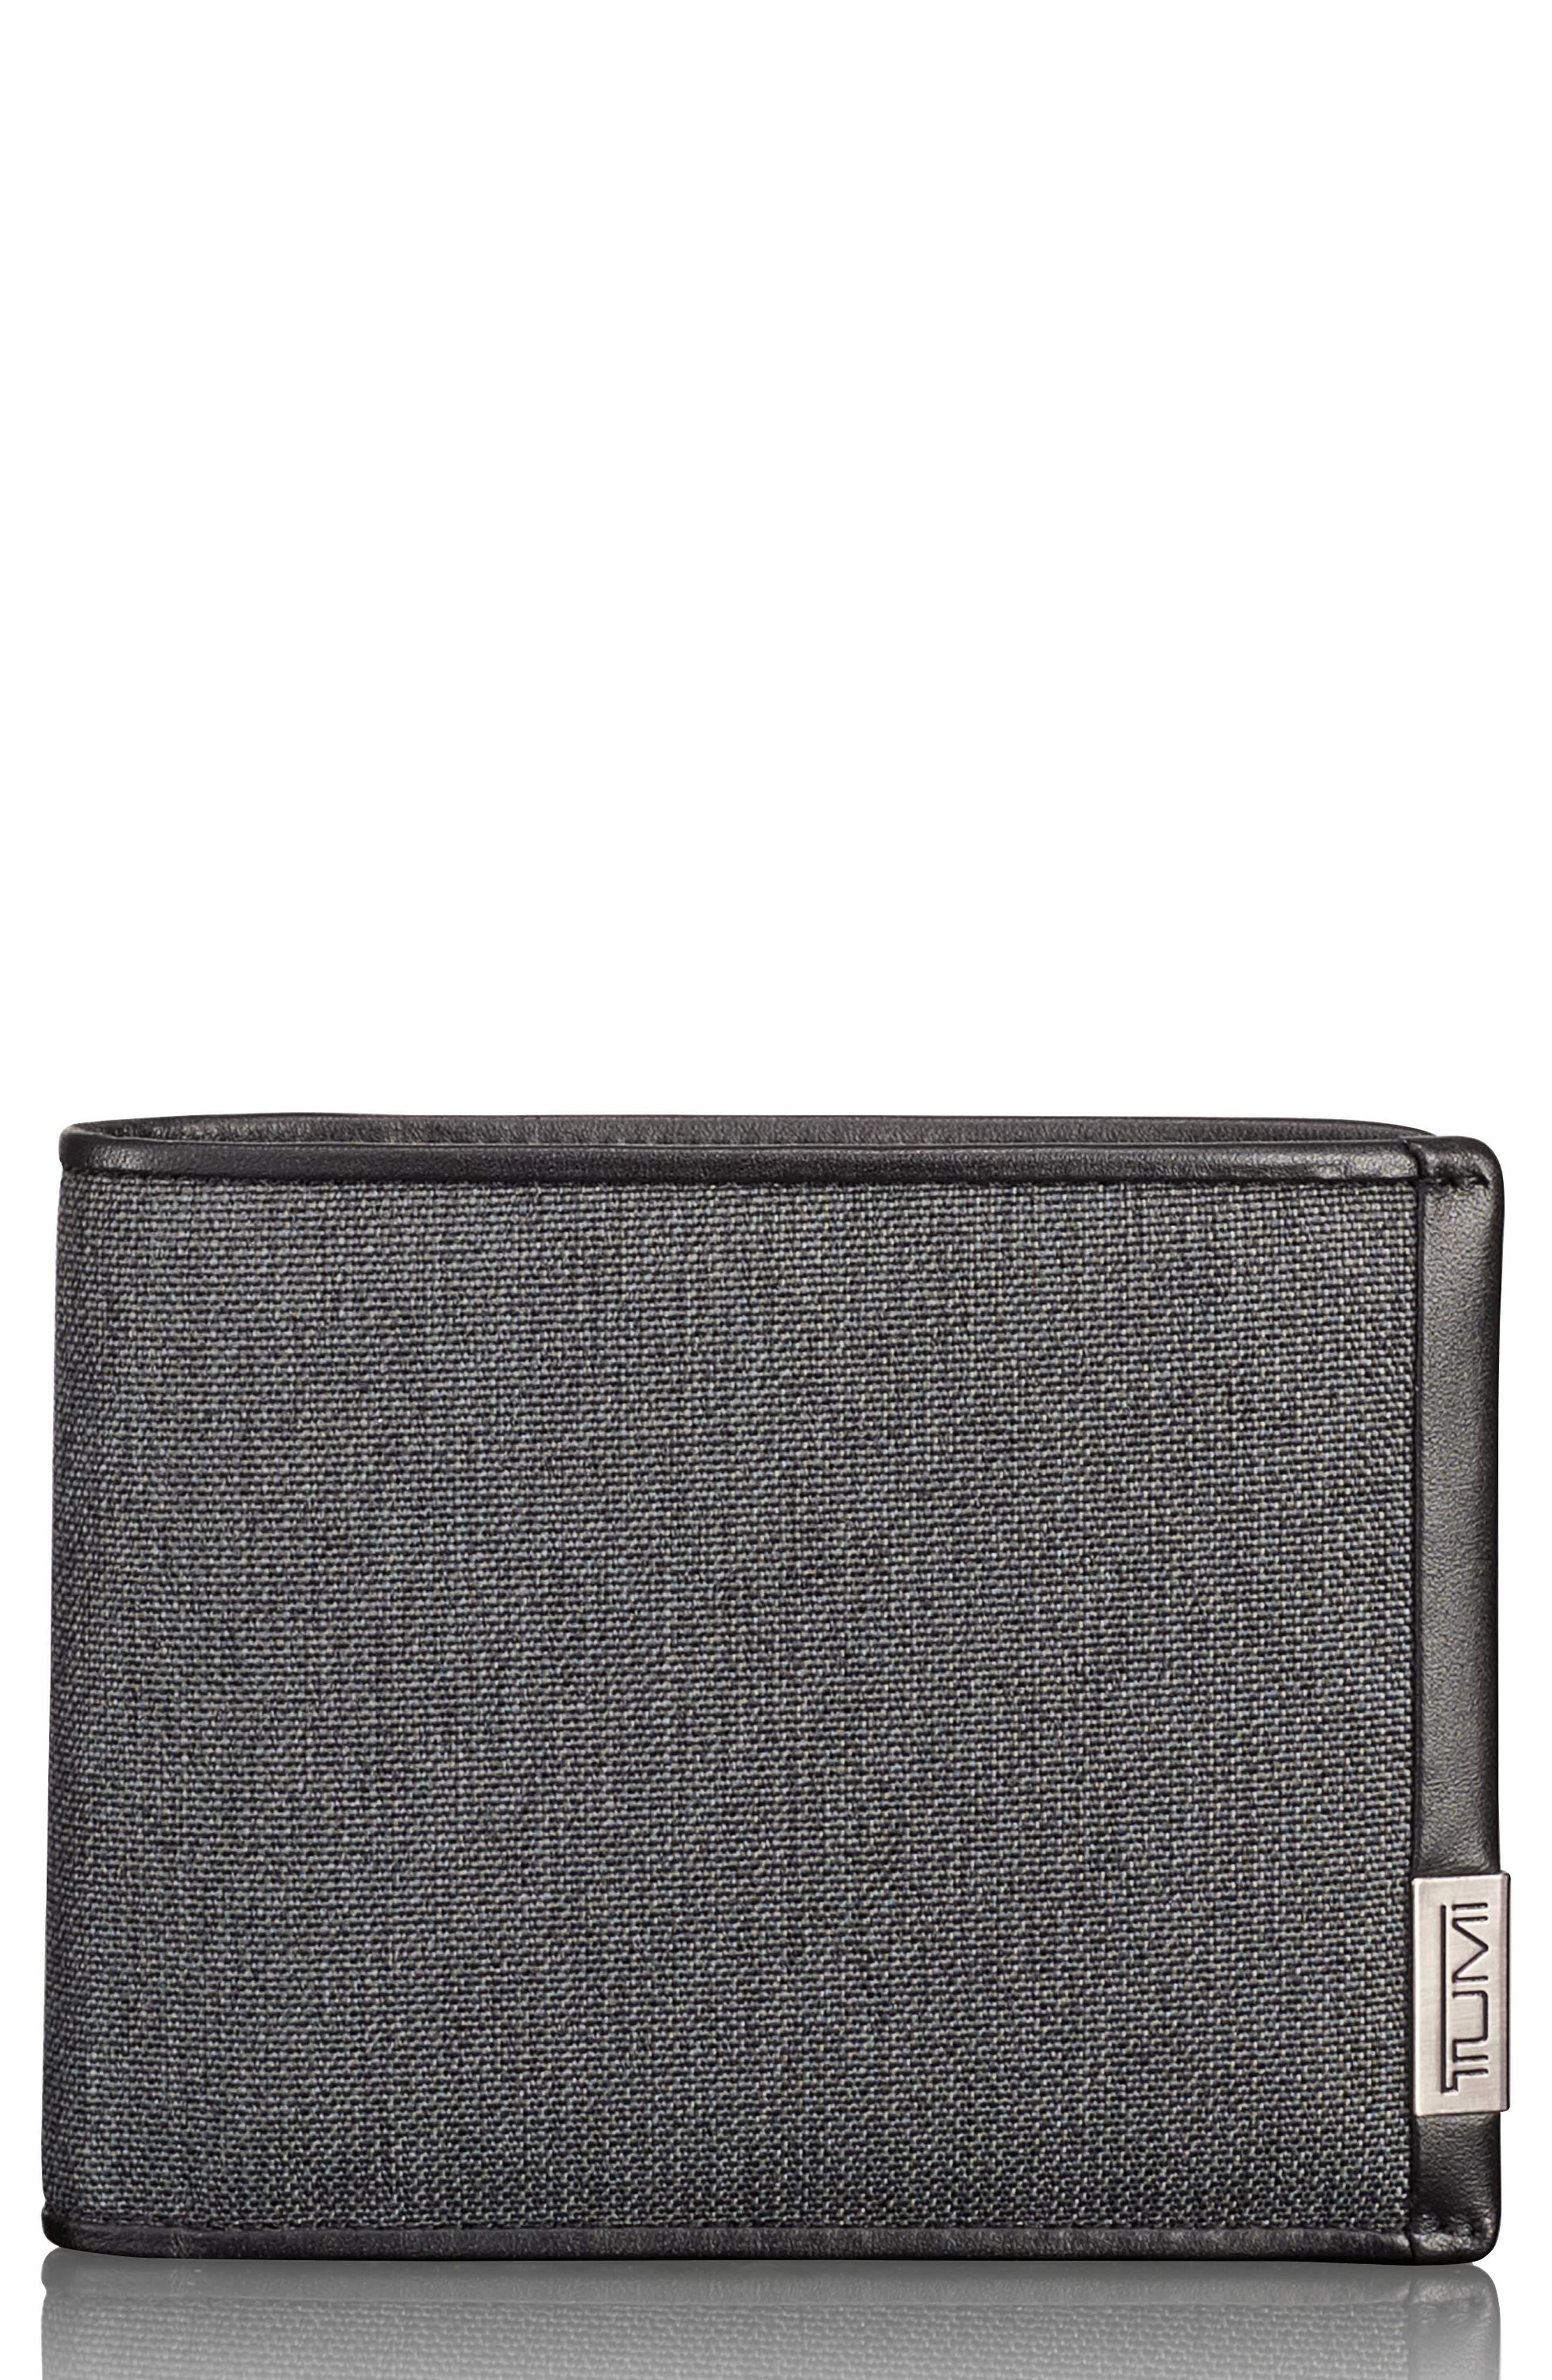 Alpha Global Pass Case Wallet,                             Main thumbnail 1, color,                             Anthracite/ Black